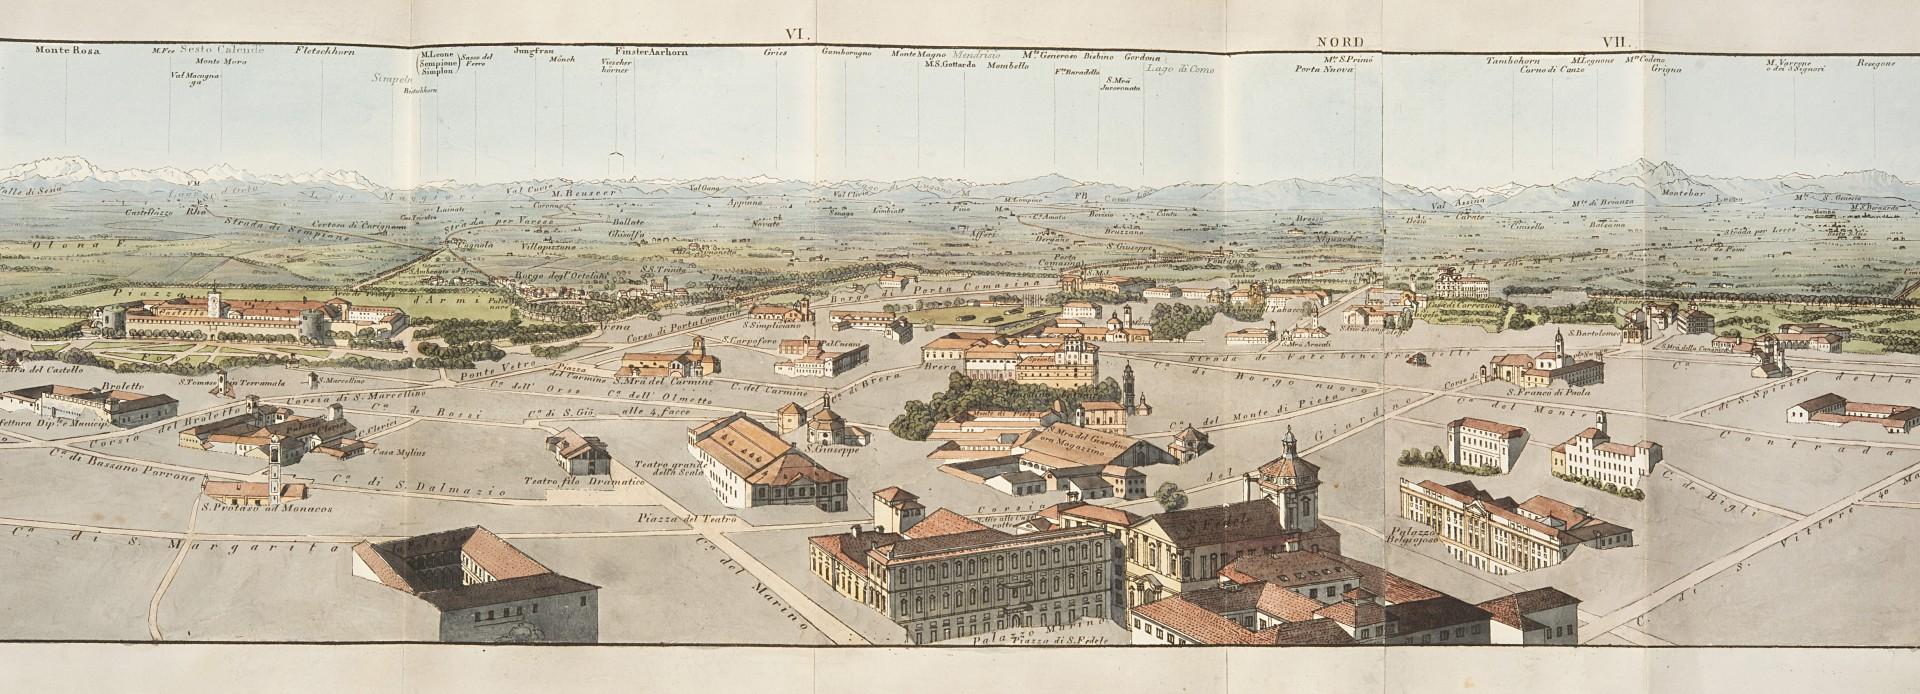 Keller, Heinrich Panorame de Milan. Panorama von Mailand. - Image 3 of 3